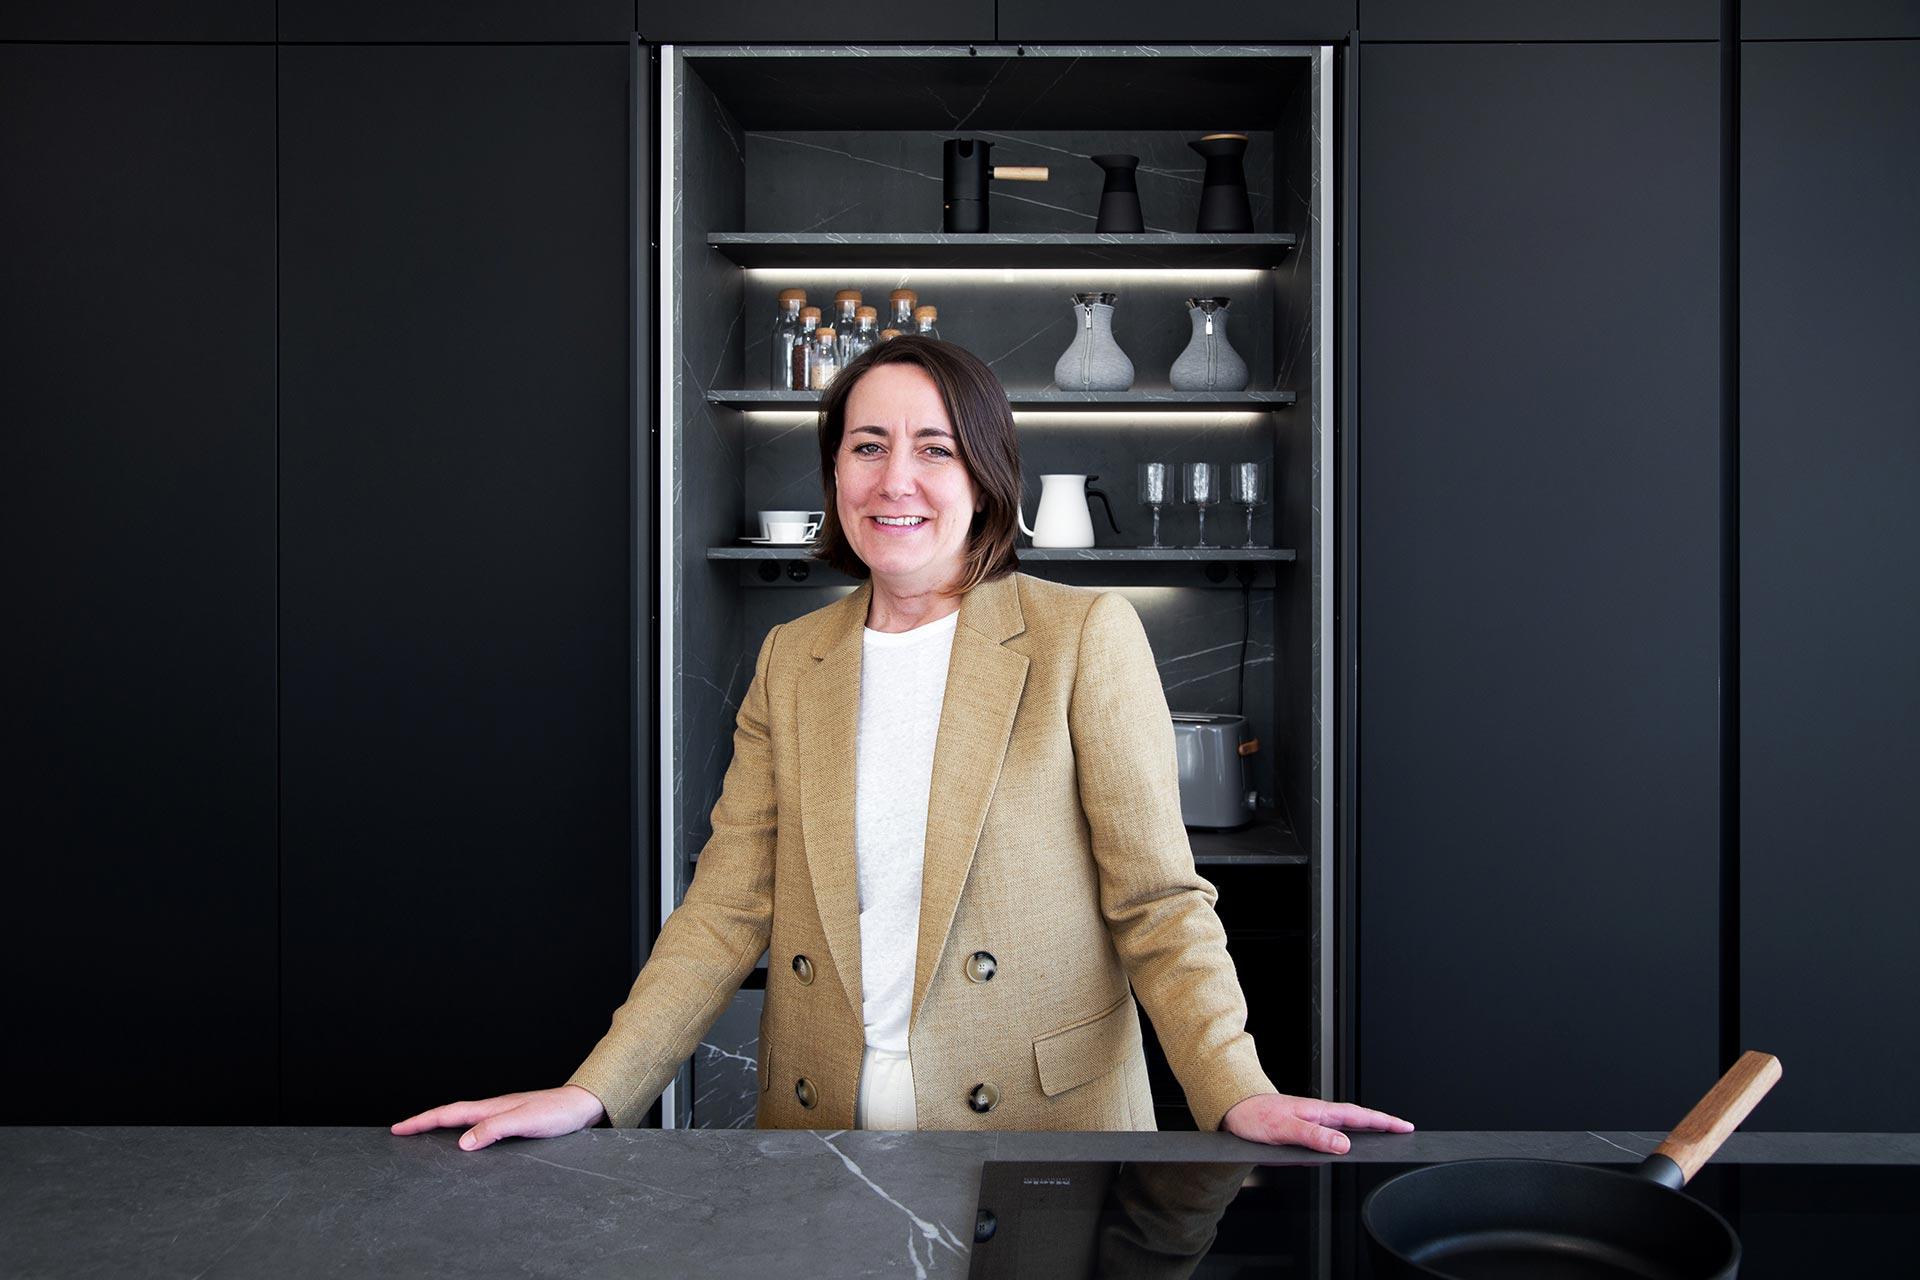 Sonsoles Cabana Murias, manager van Santiago Interiores